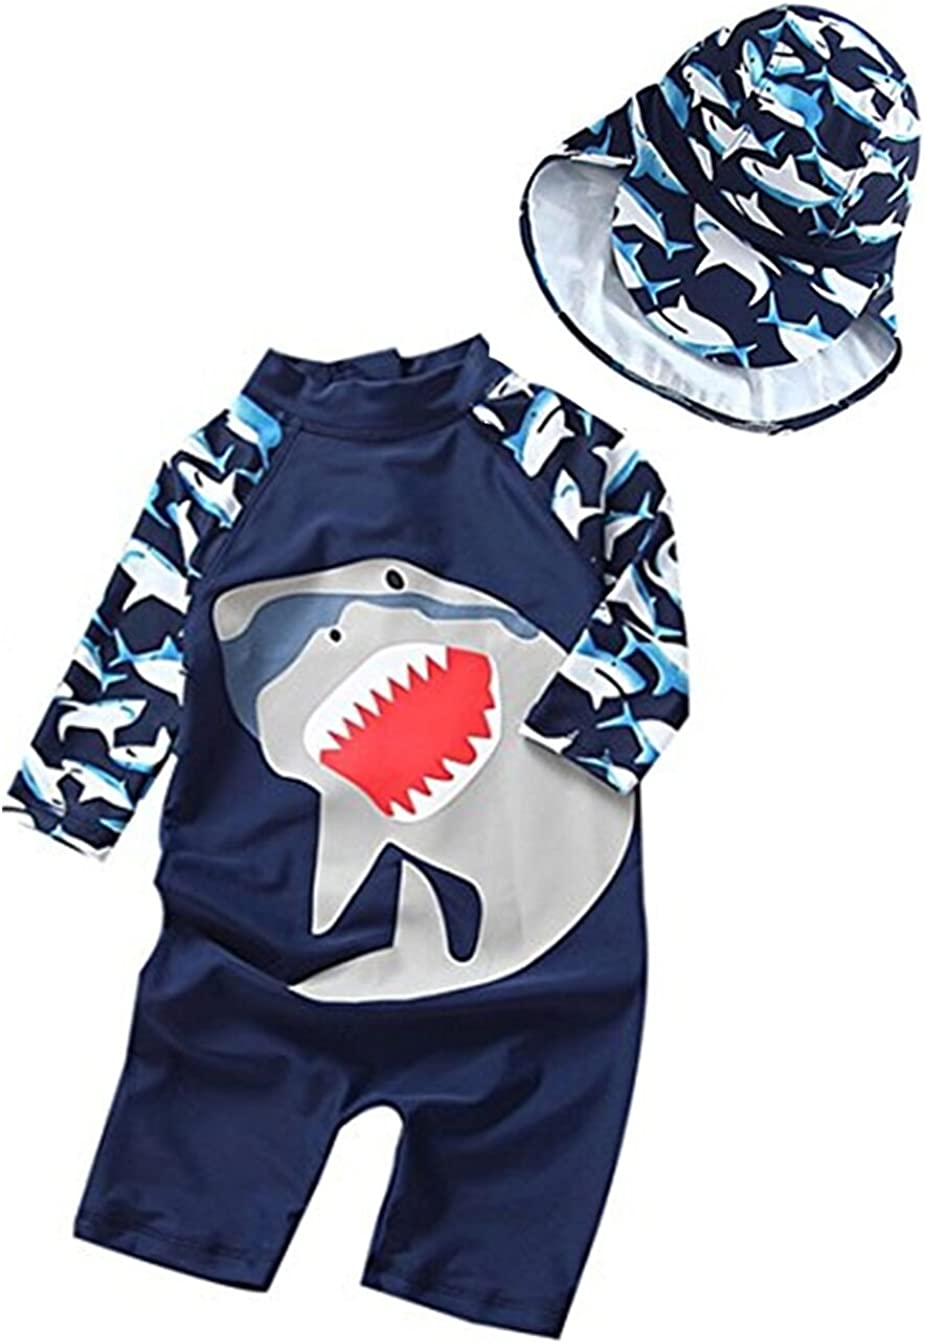 KIDDAD Kids Baby Boys Girl One-Piece Cartoon Dinosaur Rash Guard Long Sleeve Swimsuit Sun Protection Bathing Suit